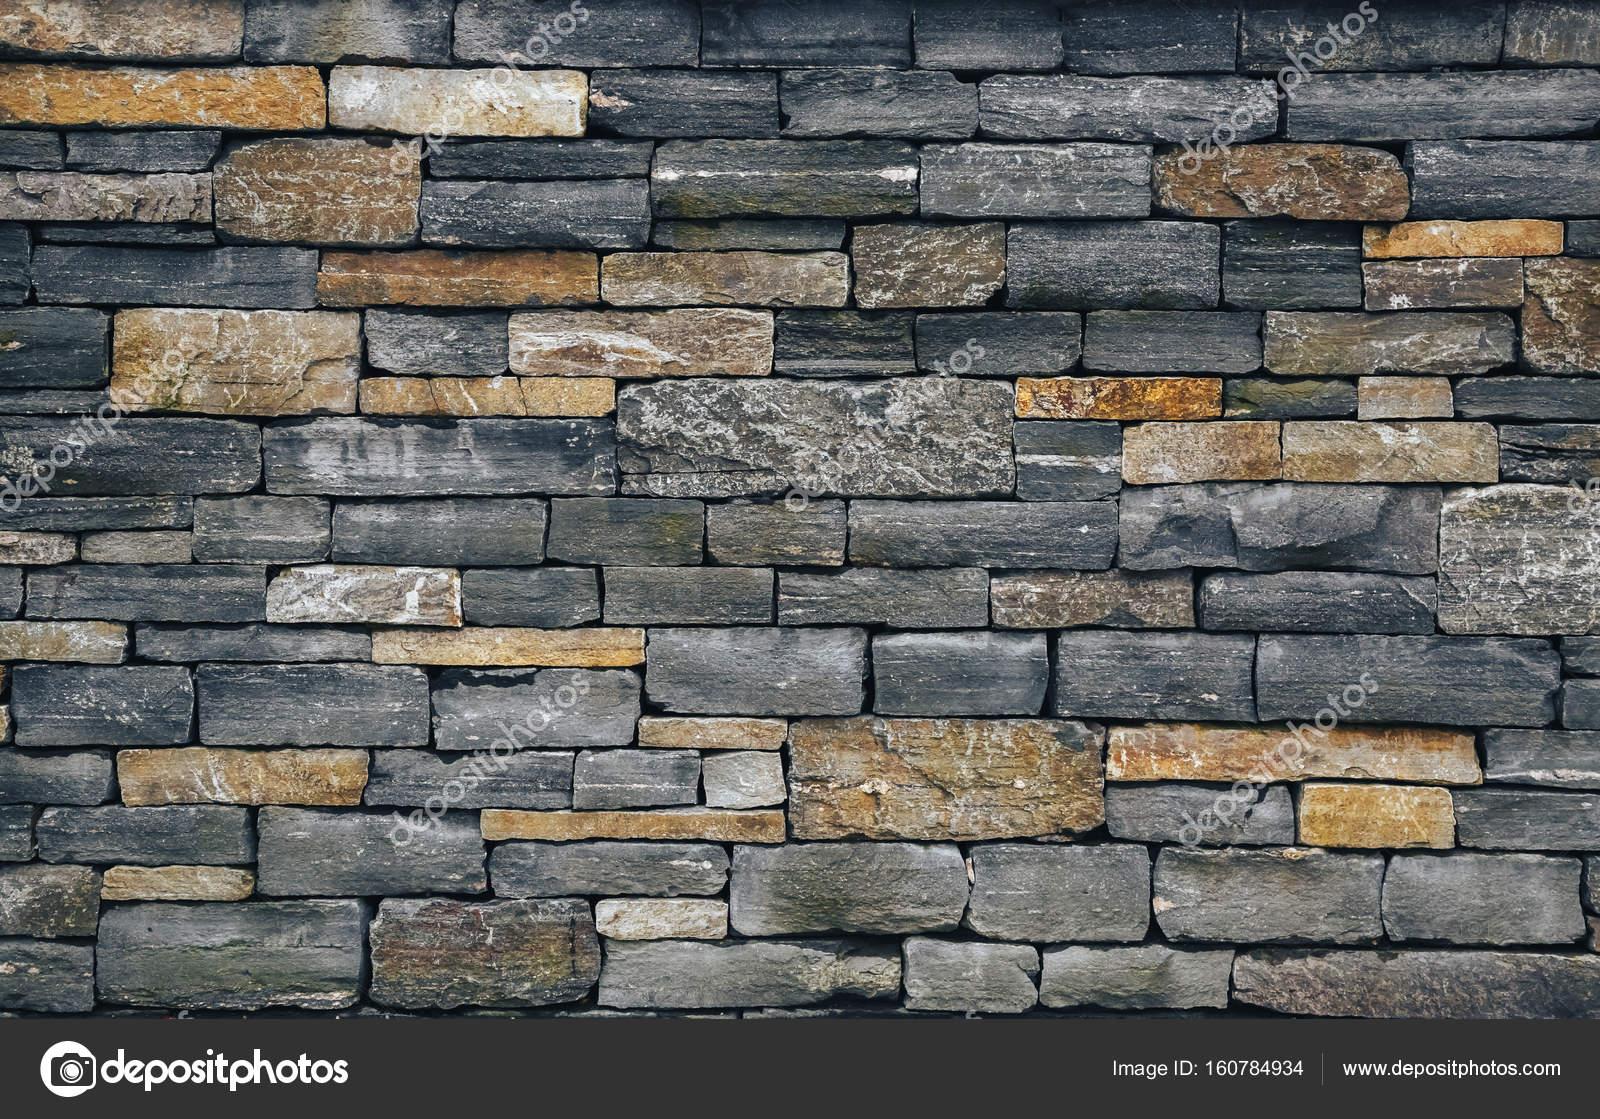 mur en pierres texture brique de la roche texture de la pierre pierres de couleur diff rente. Black Bedroom Furniture Sets. Home Design Ideas